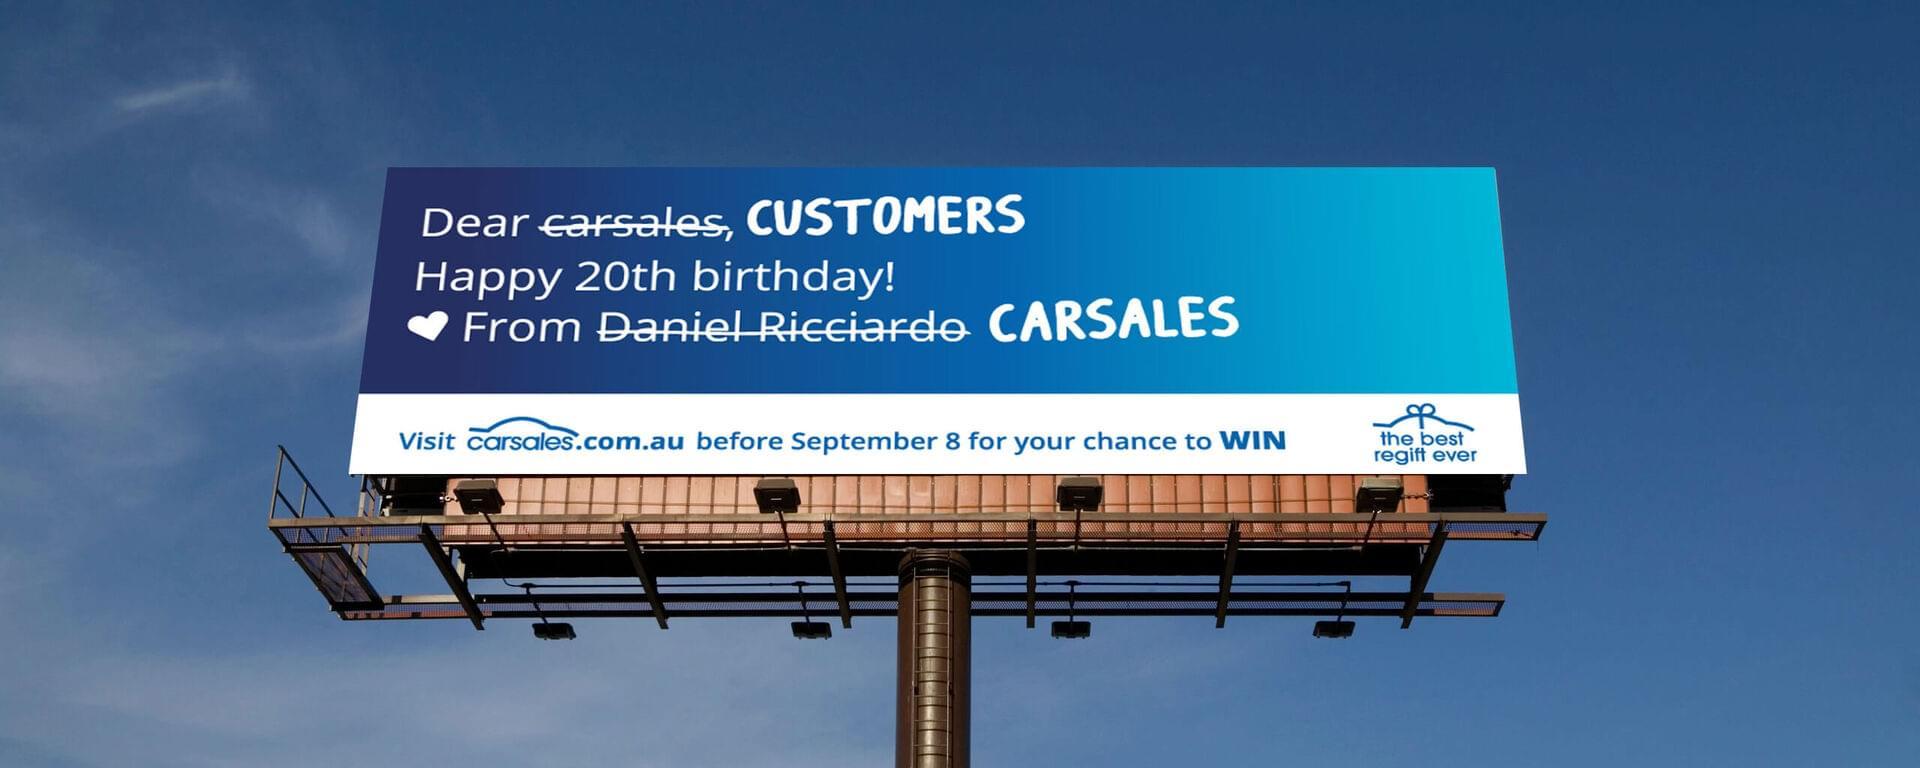 Carsales Customer Service Story | Zendesk